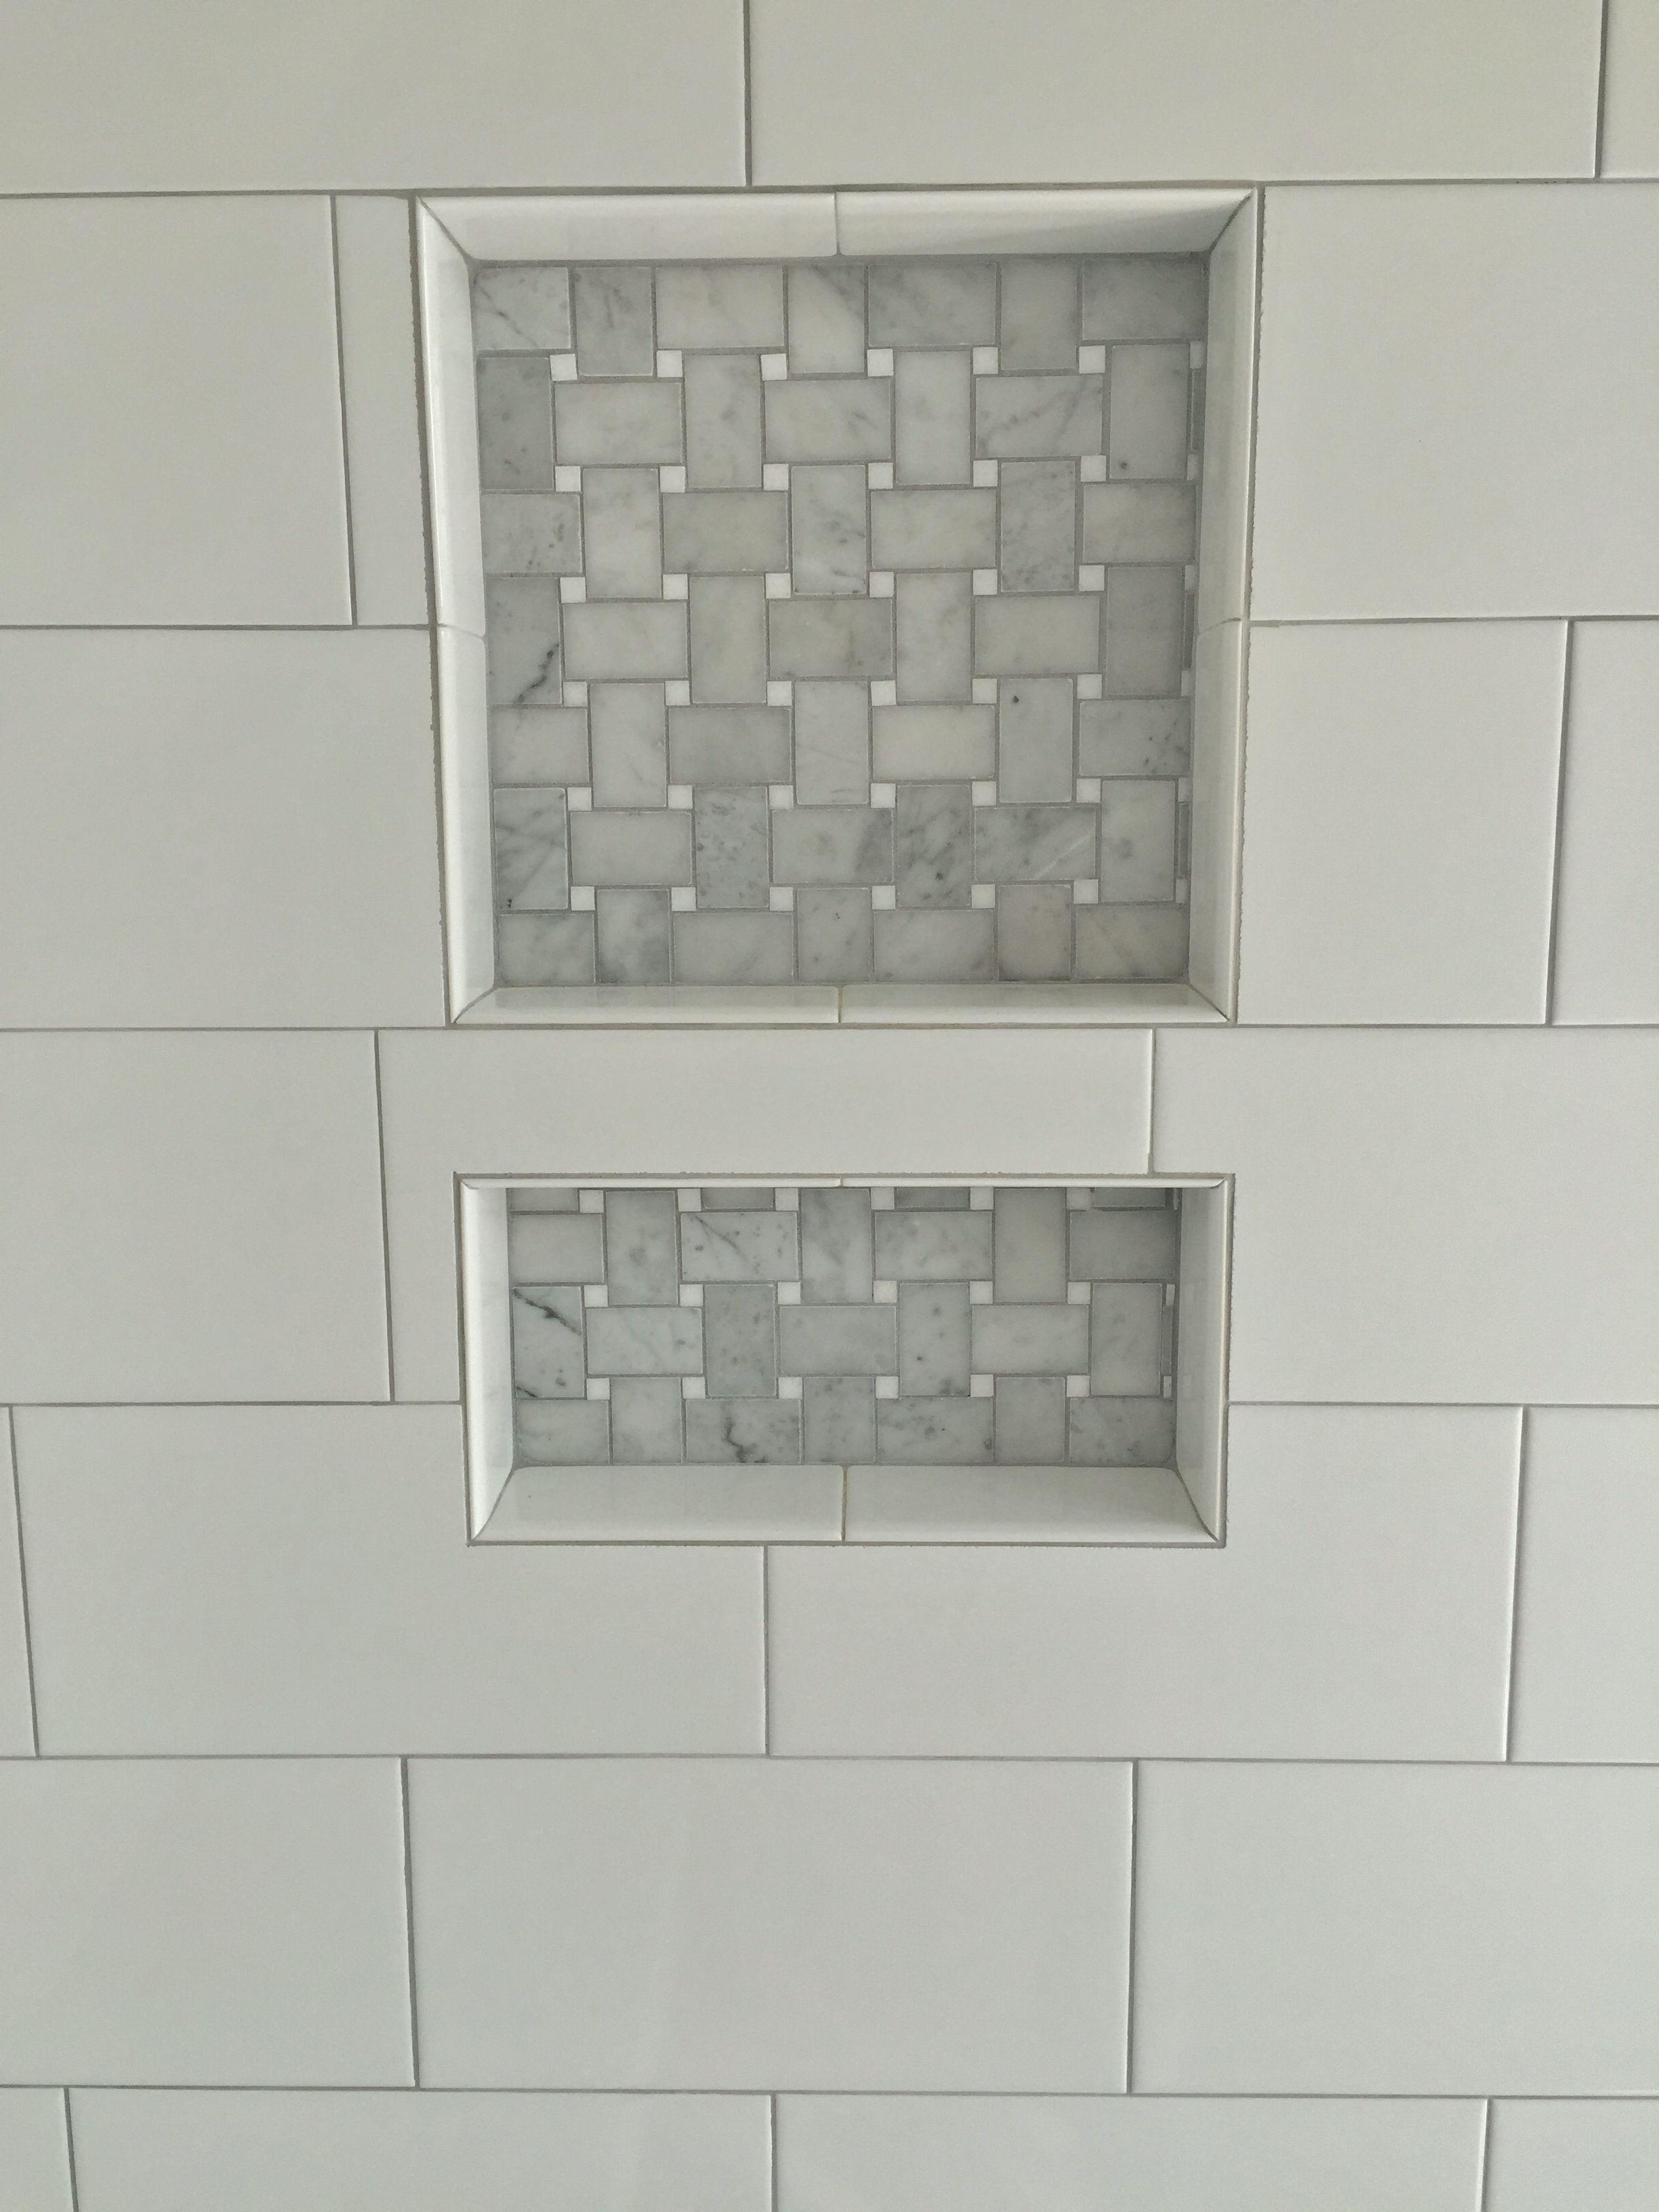 6x12 white porcelain tile with stone